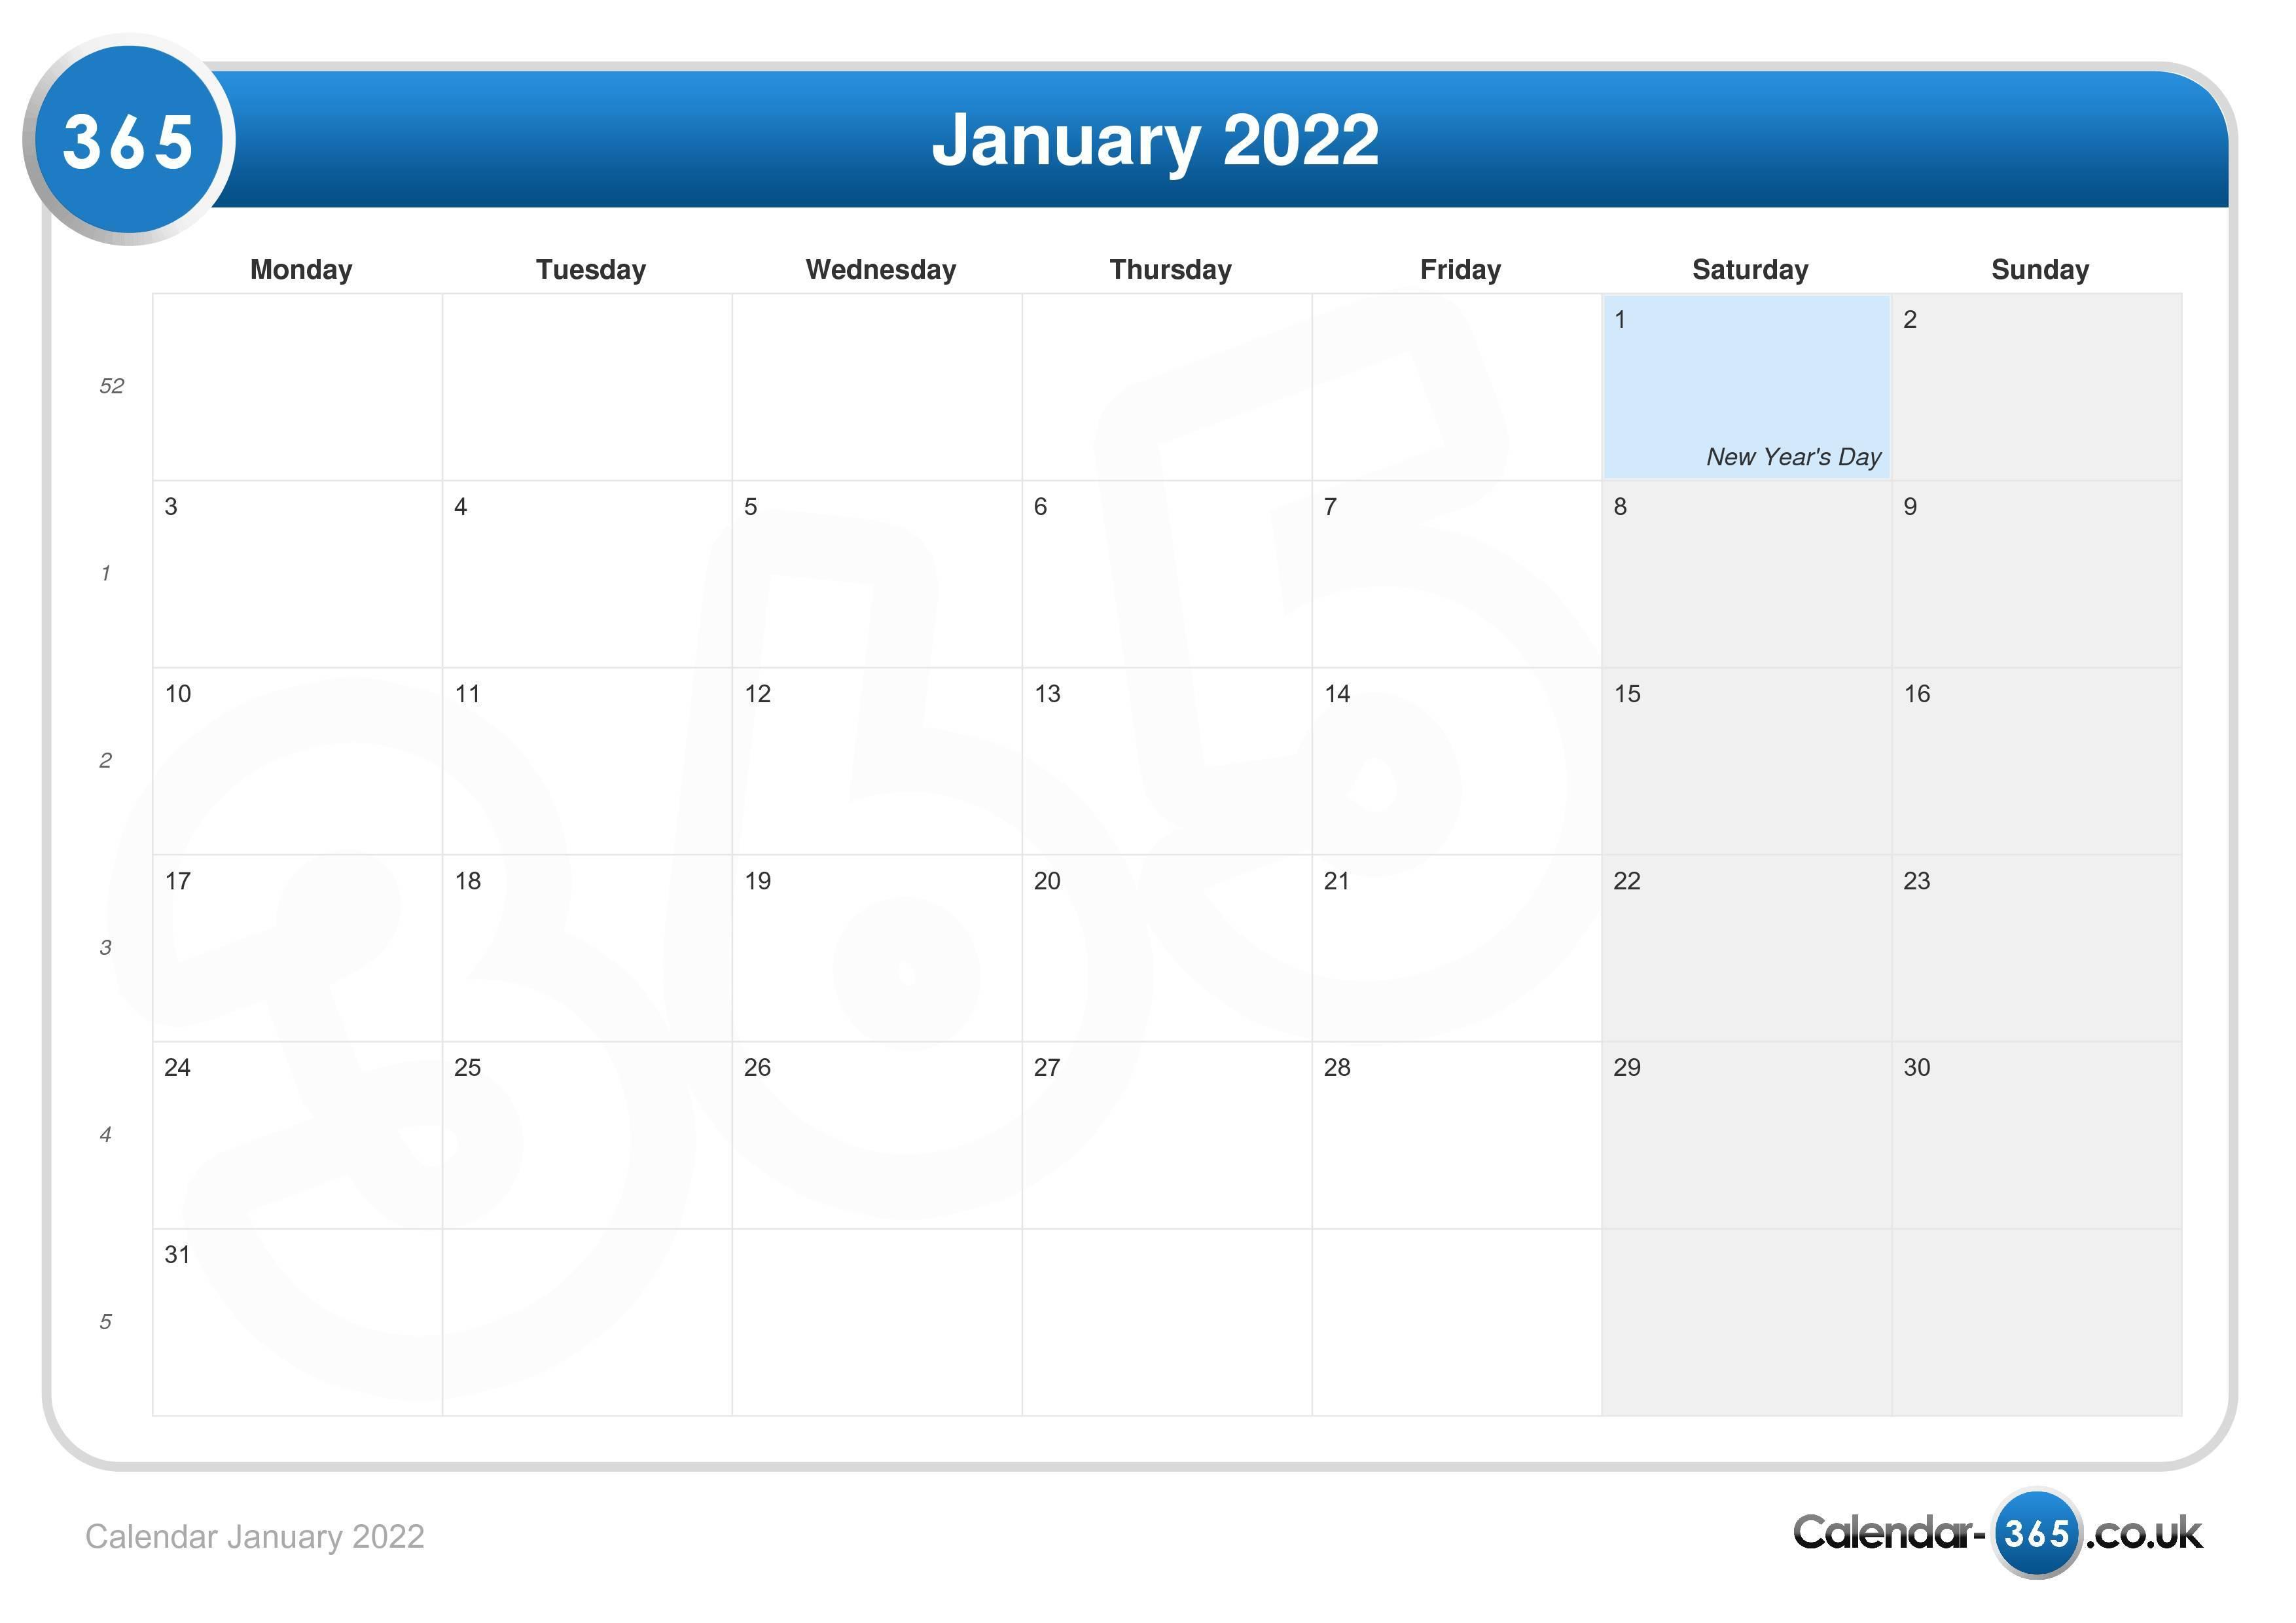 Lunar Calendar January 2022.Calendar January 2022